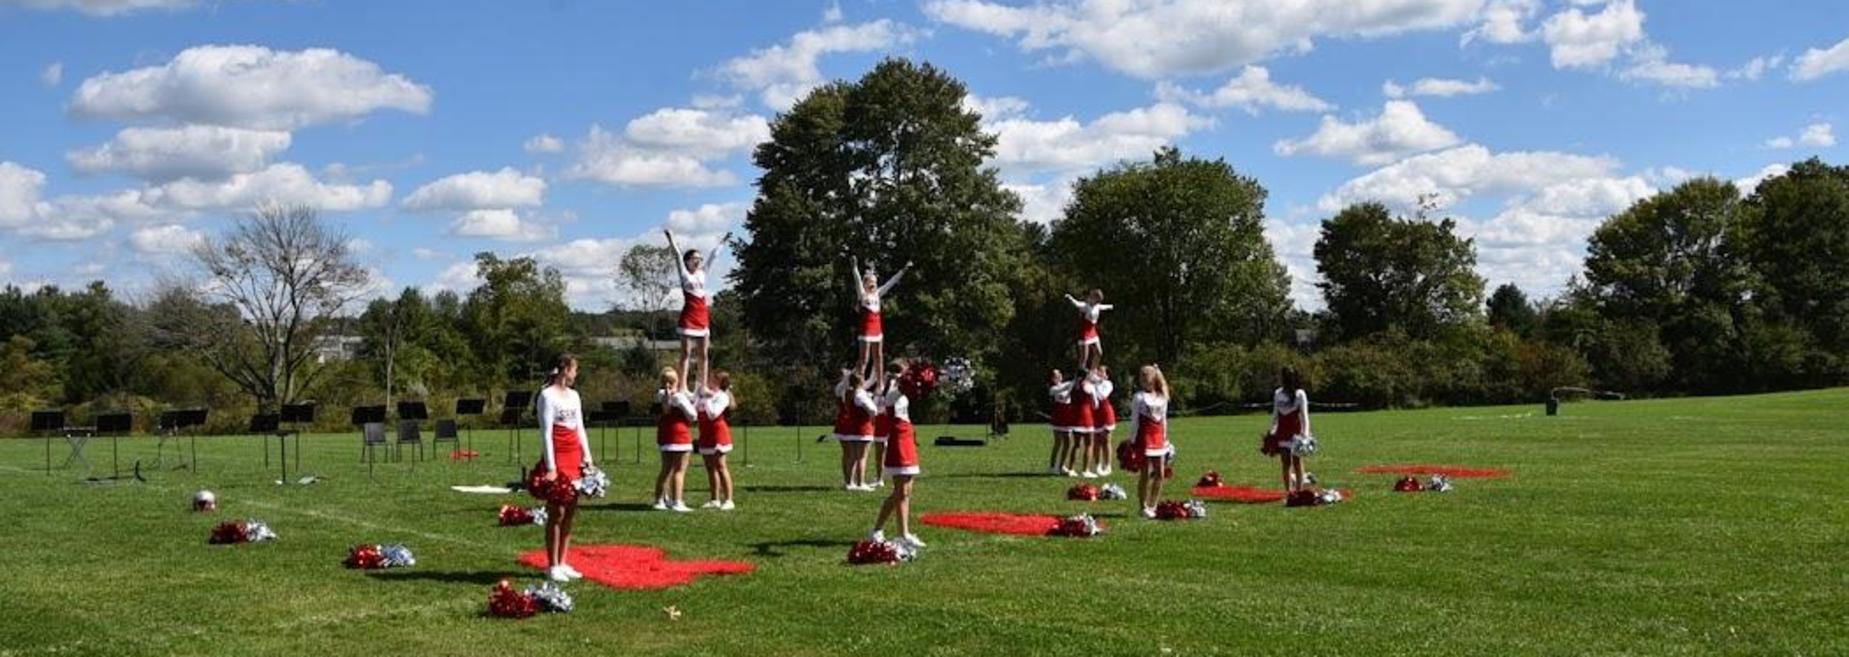 Cheerleaders at the pep rally